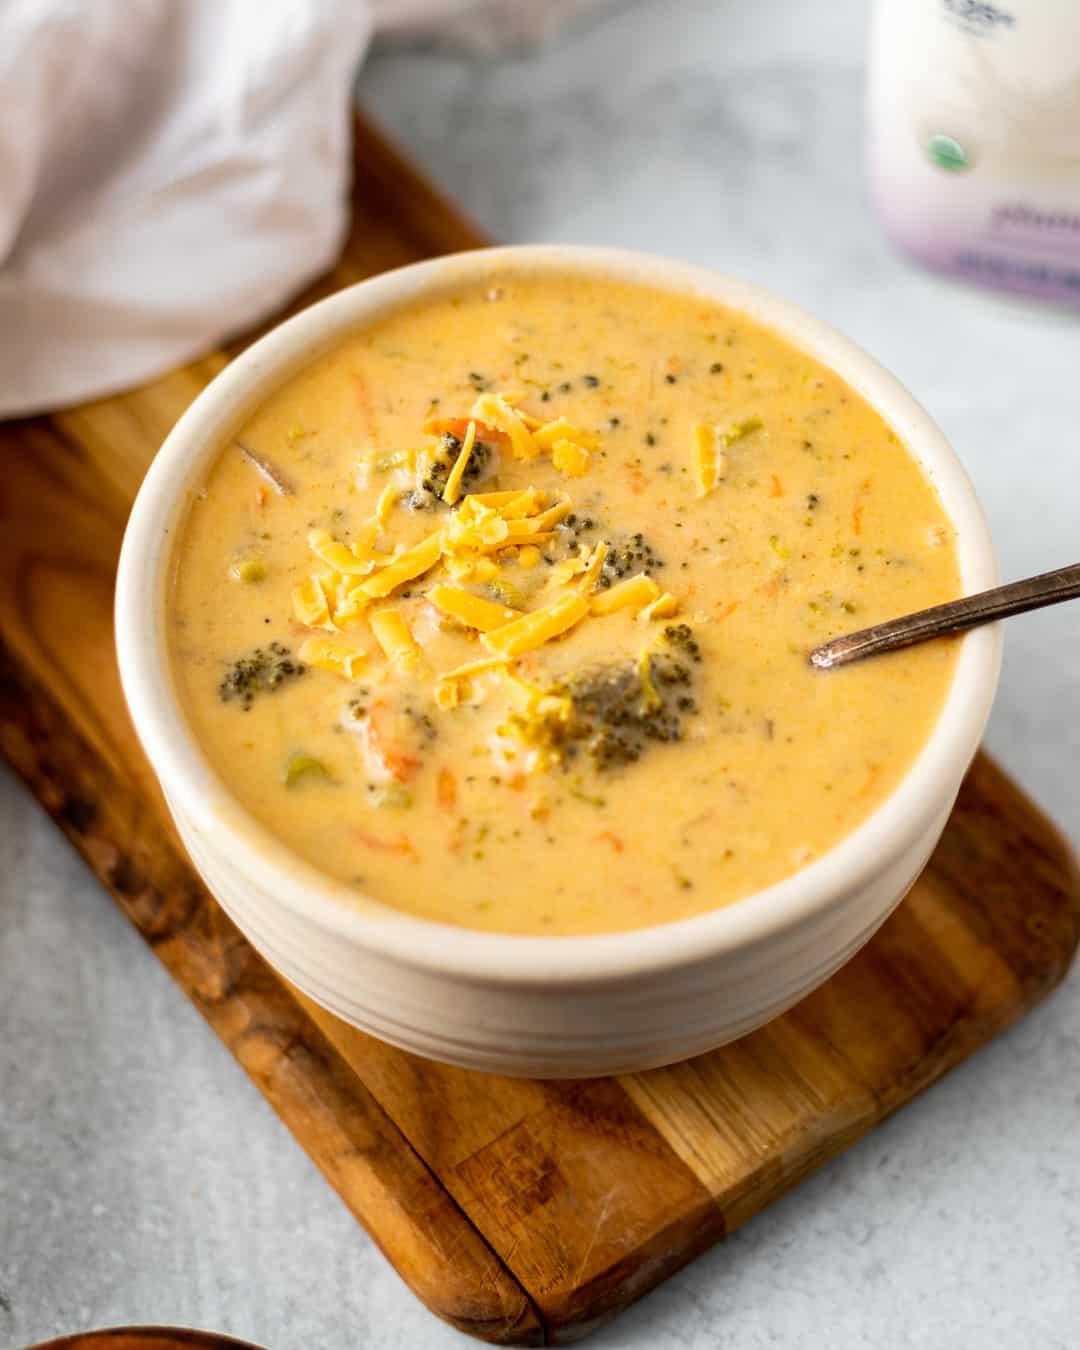 Healthy Broccoli Cheddar Soup